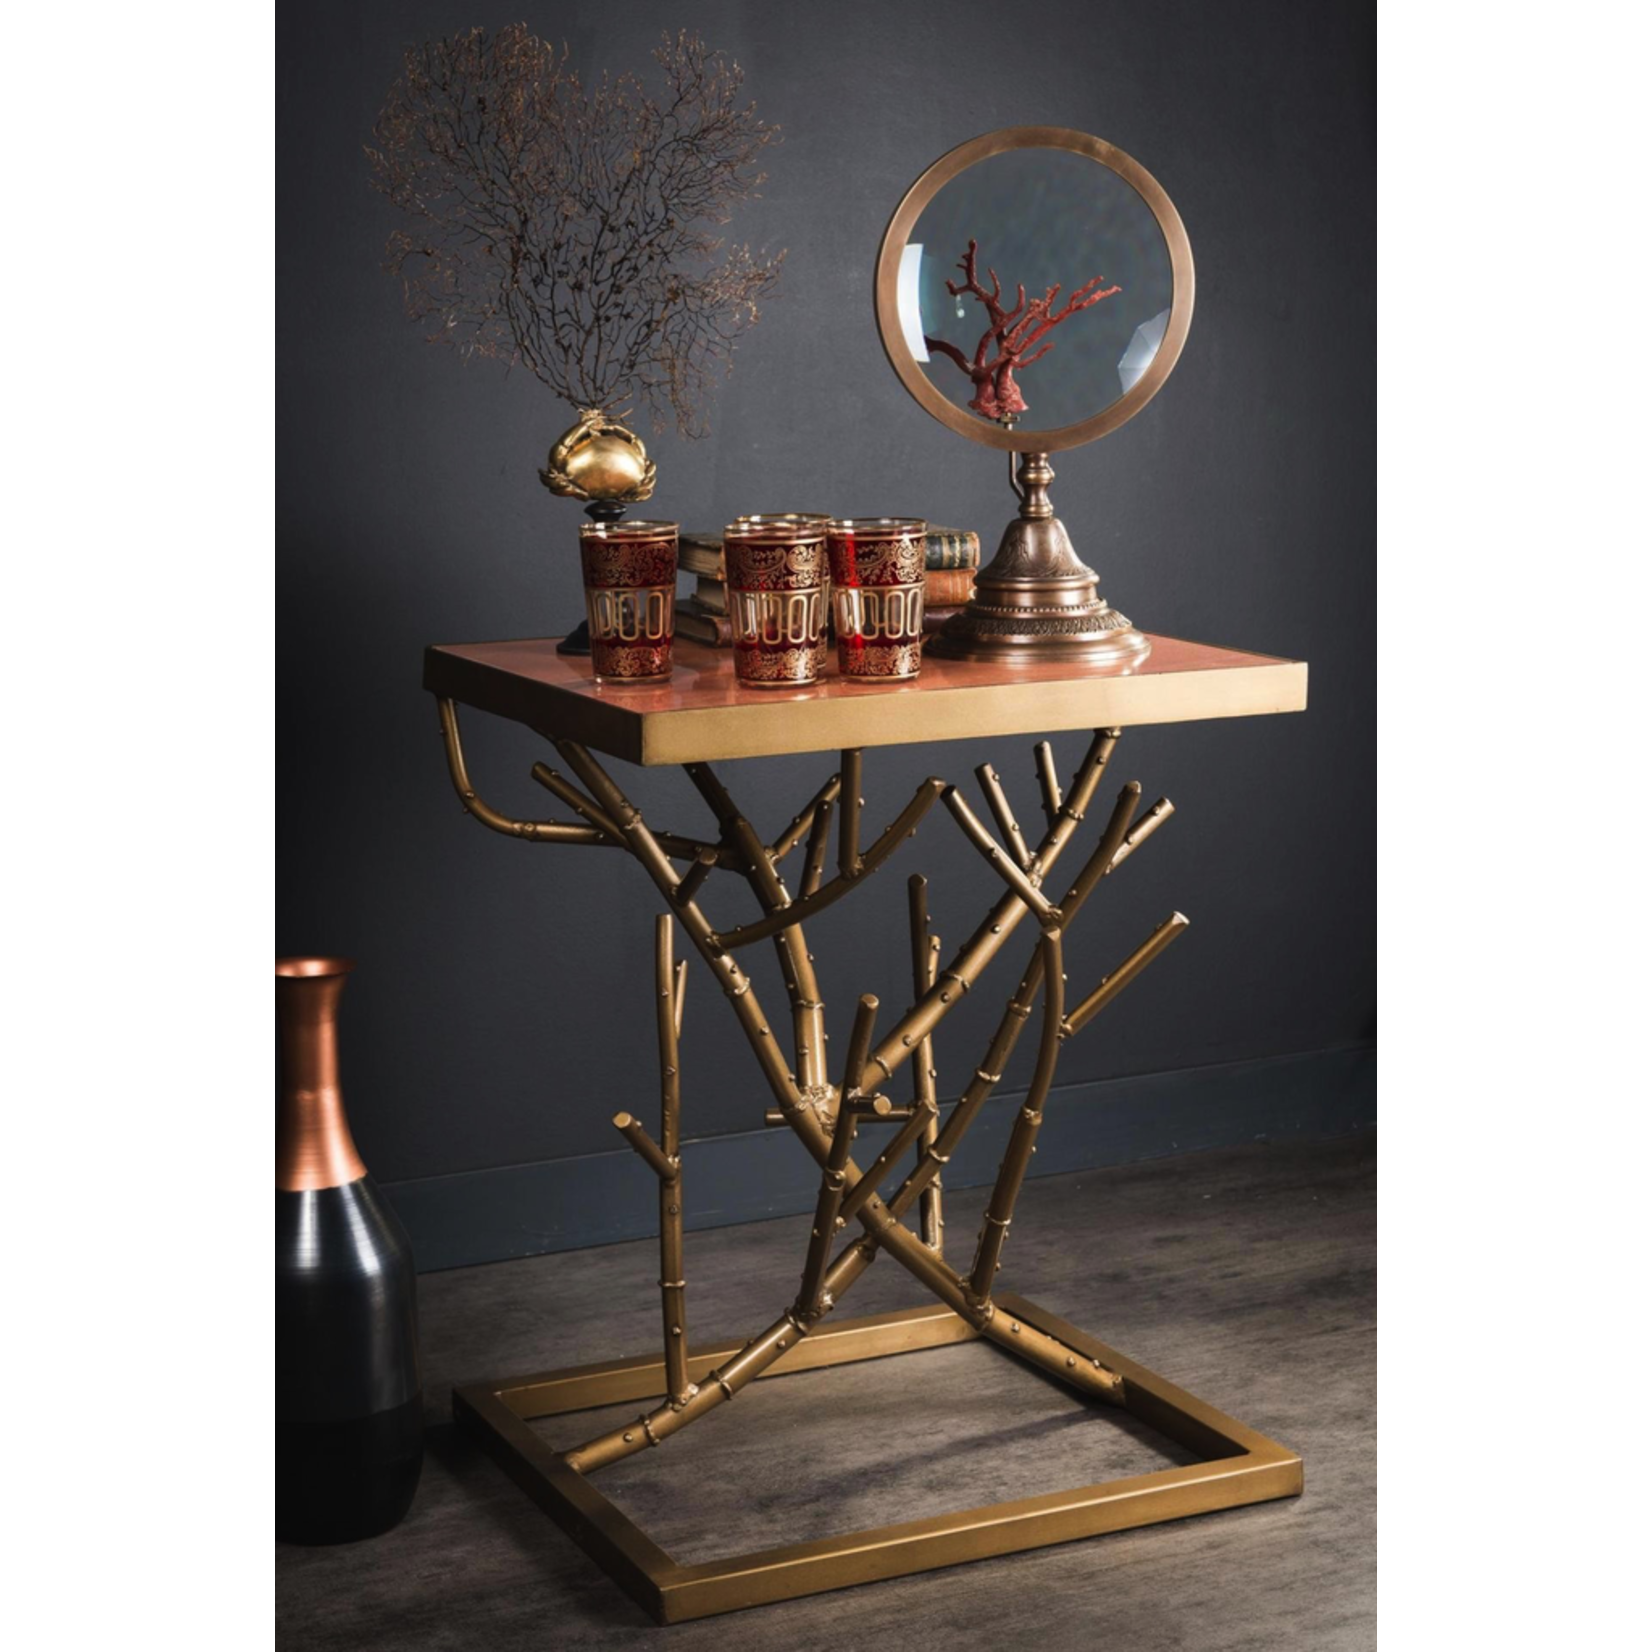 OBJET DE CURIOSITE SIDE TABLE PINK MARBLE TOP ON VEGETABLE IRON